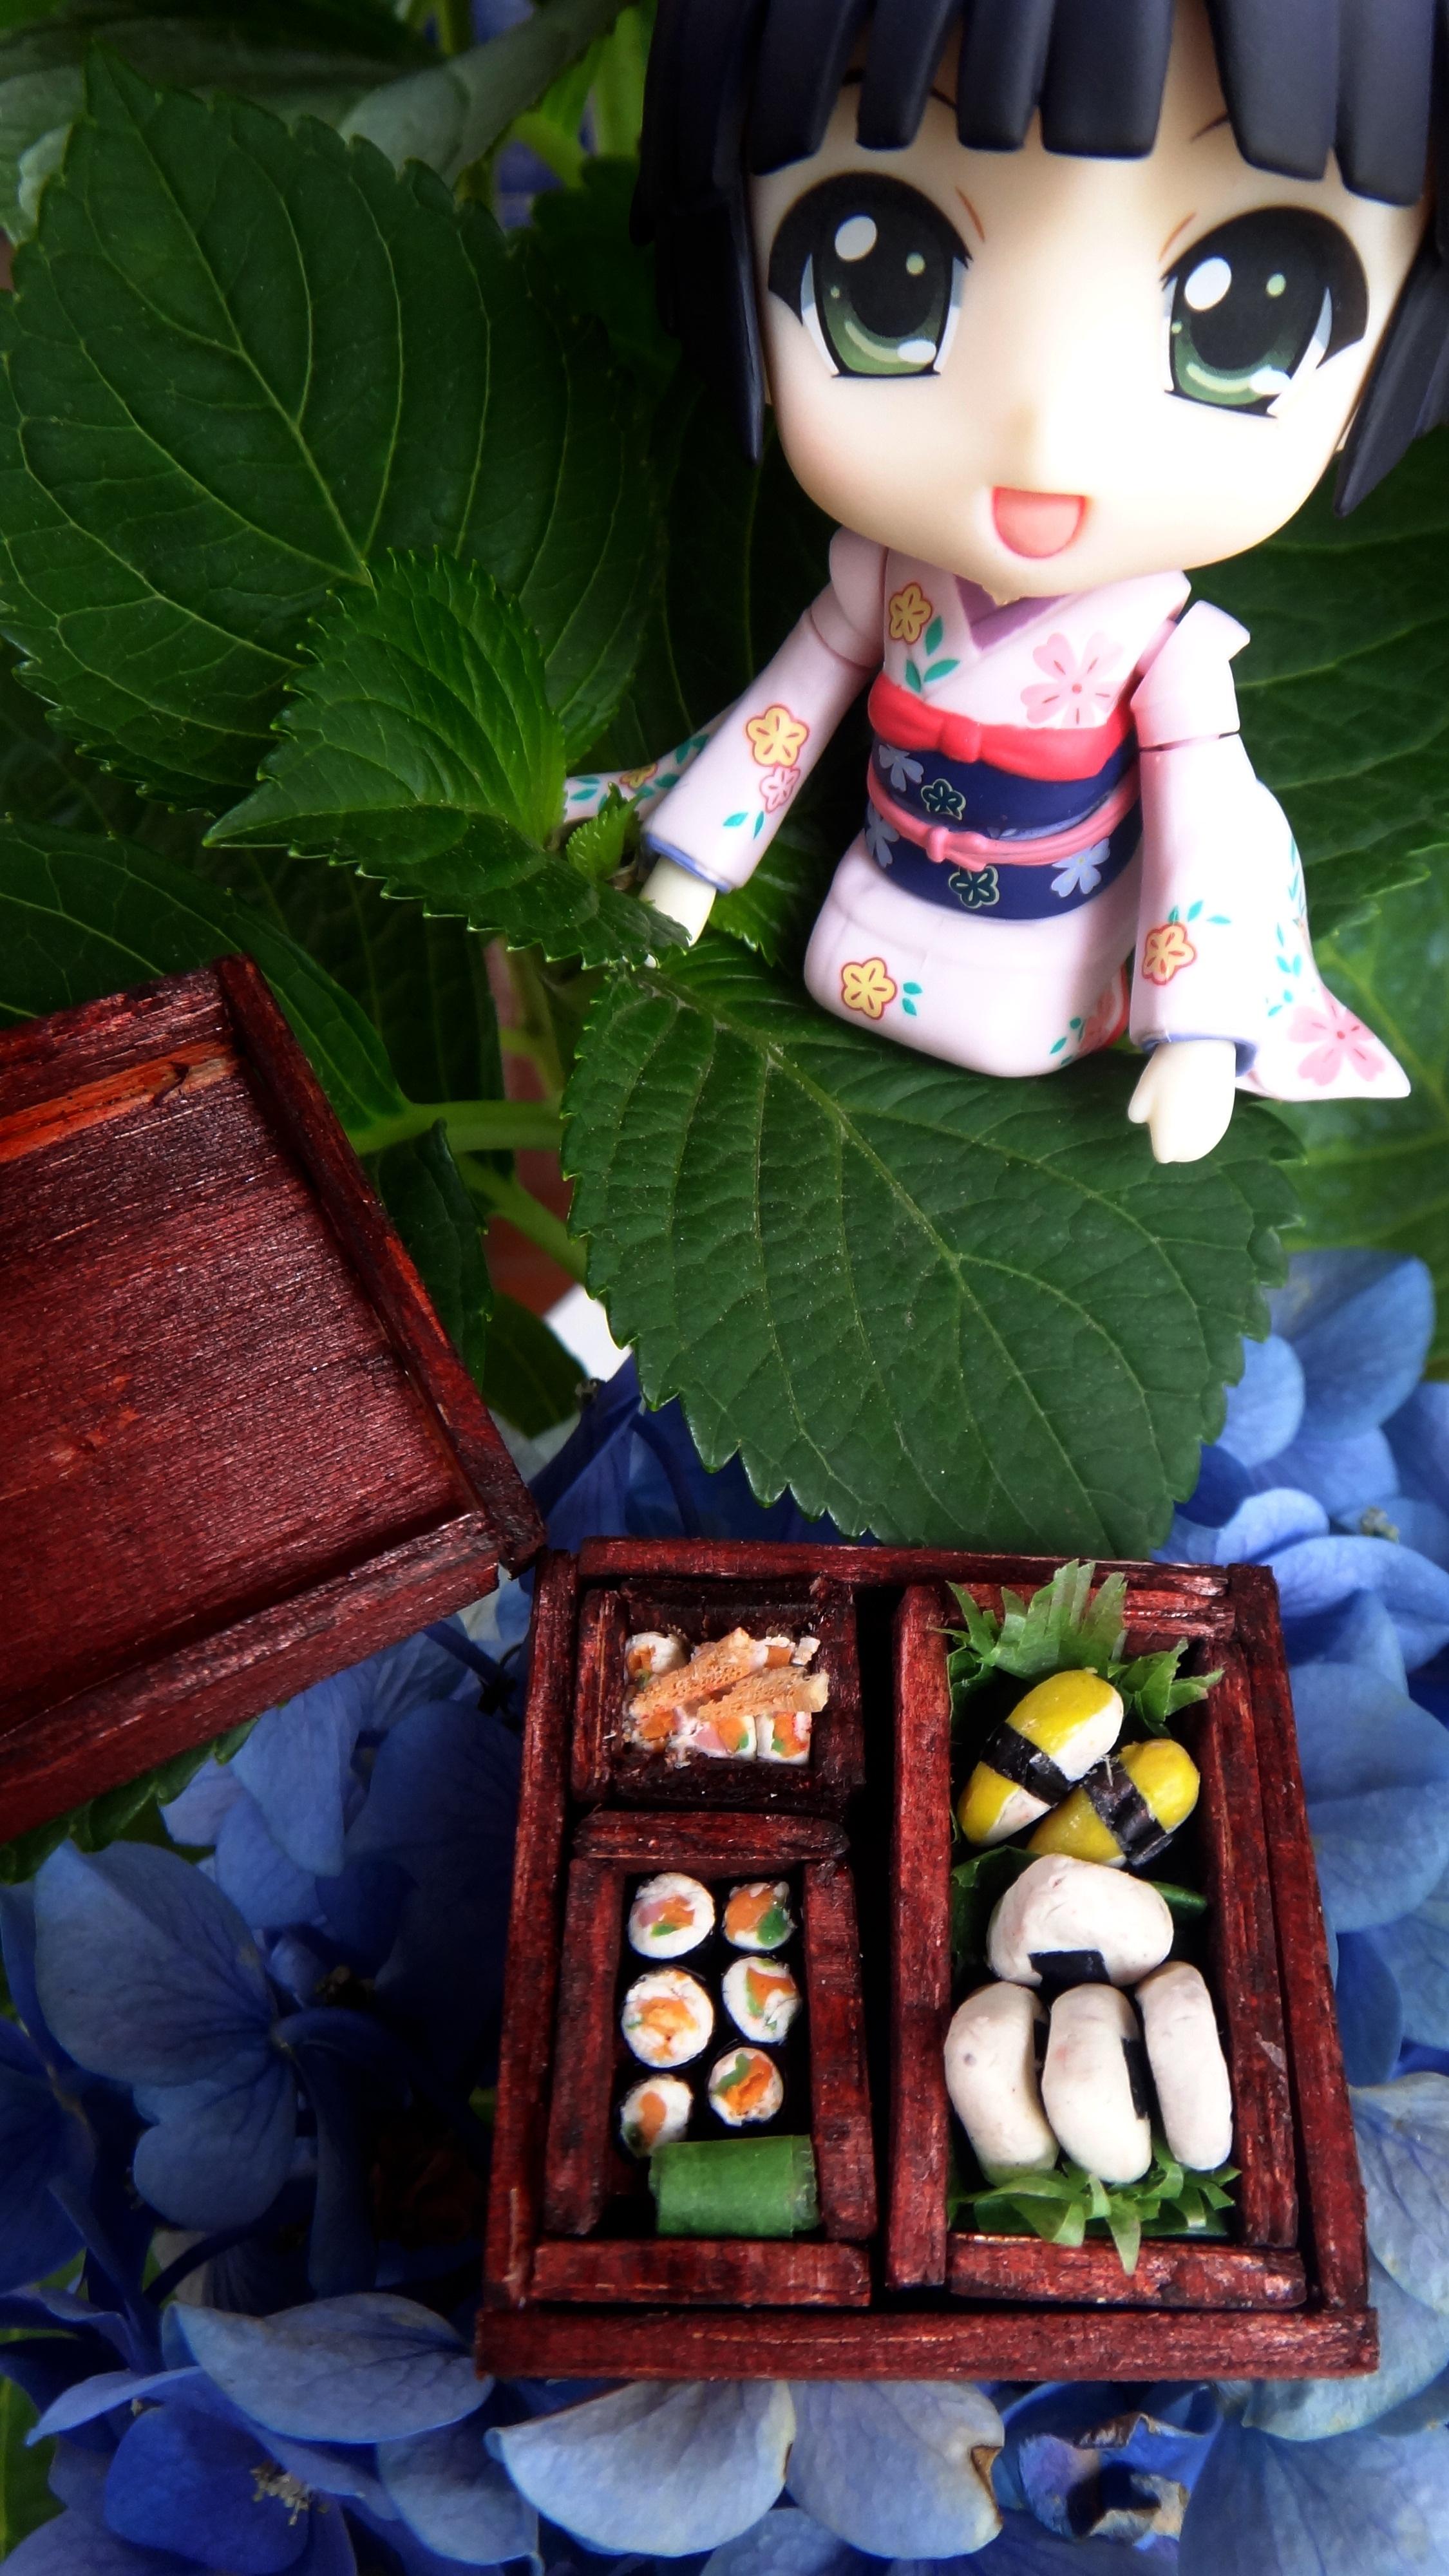 nendoroid good_smile_company nendoron udono_kazuyoshi yune ikoku_meiro_no_croisée otacute_bento